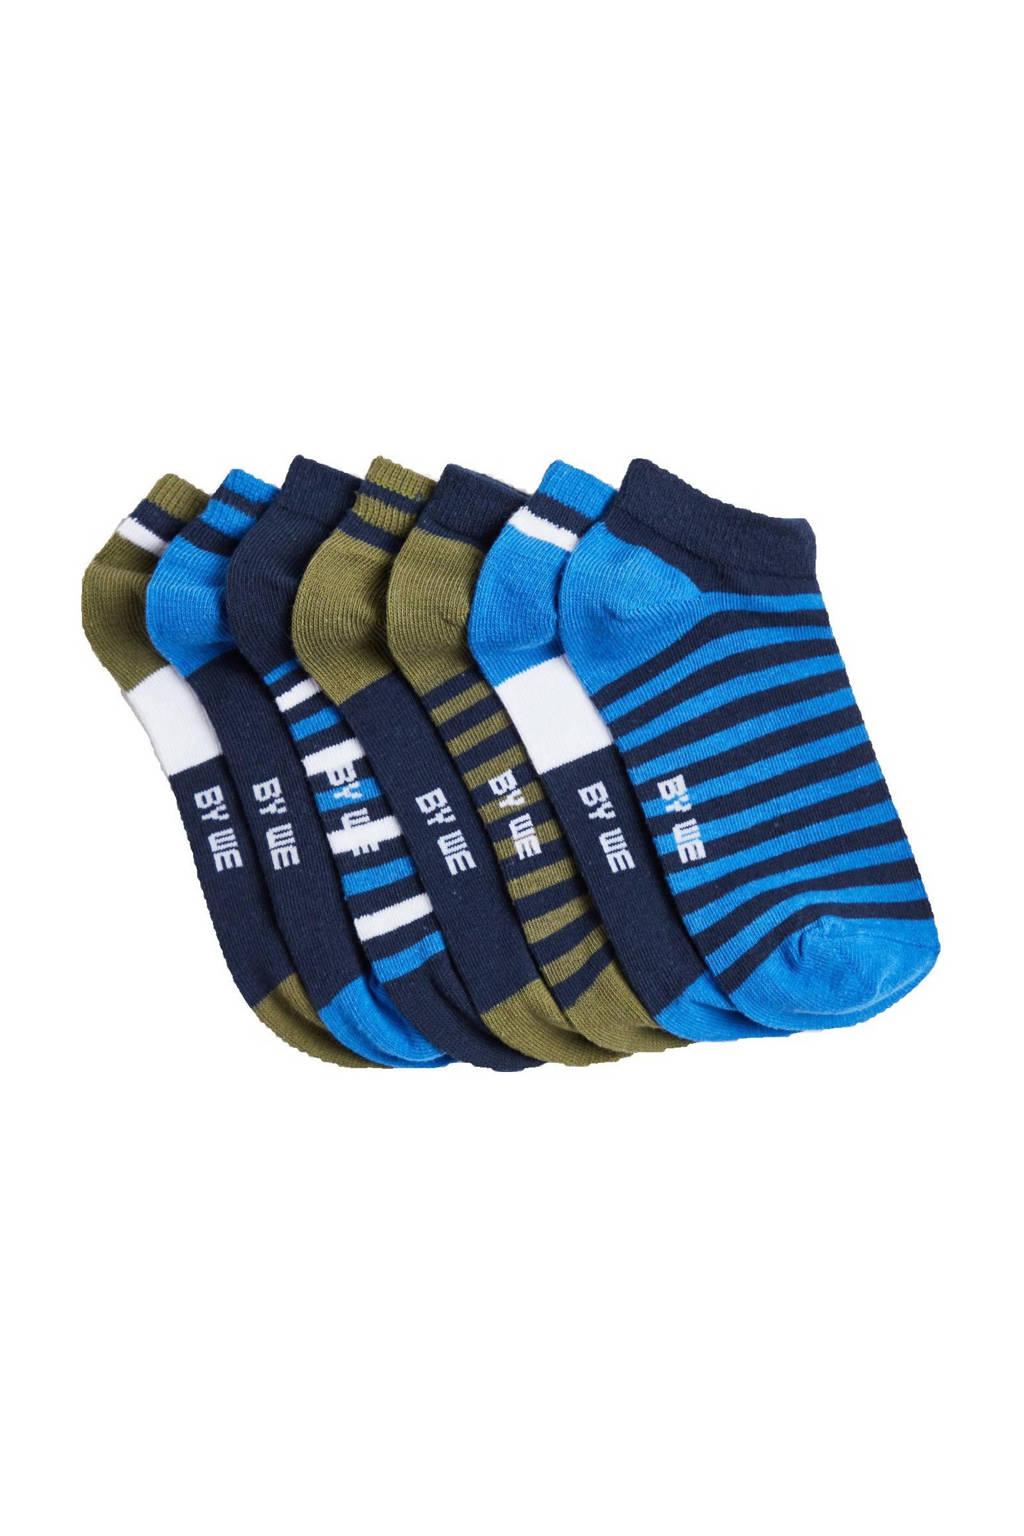 WE Fashion enkelsokken - set van 7 blauw/kaki, Blauw/donkerblauw/kaki